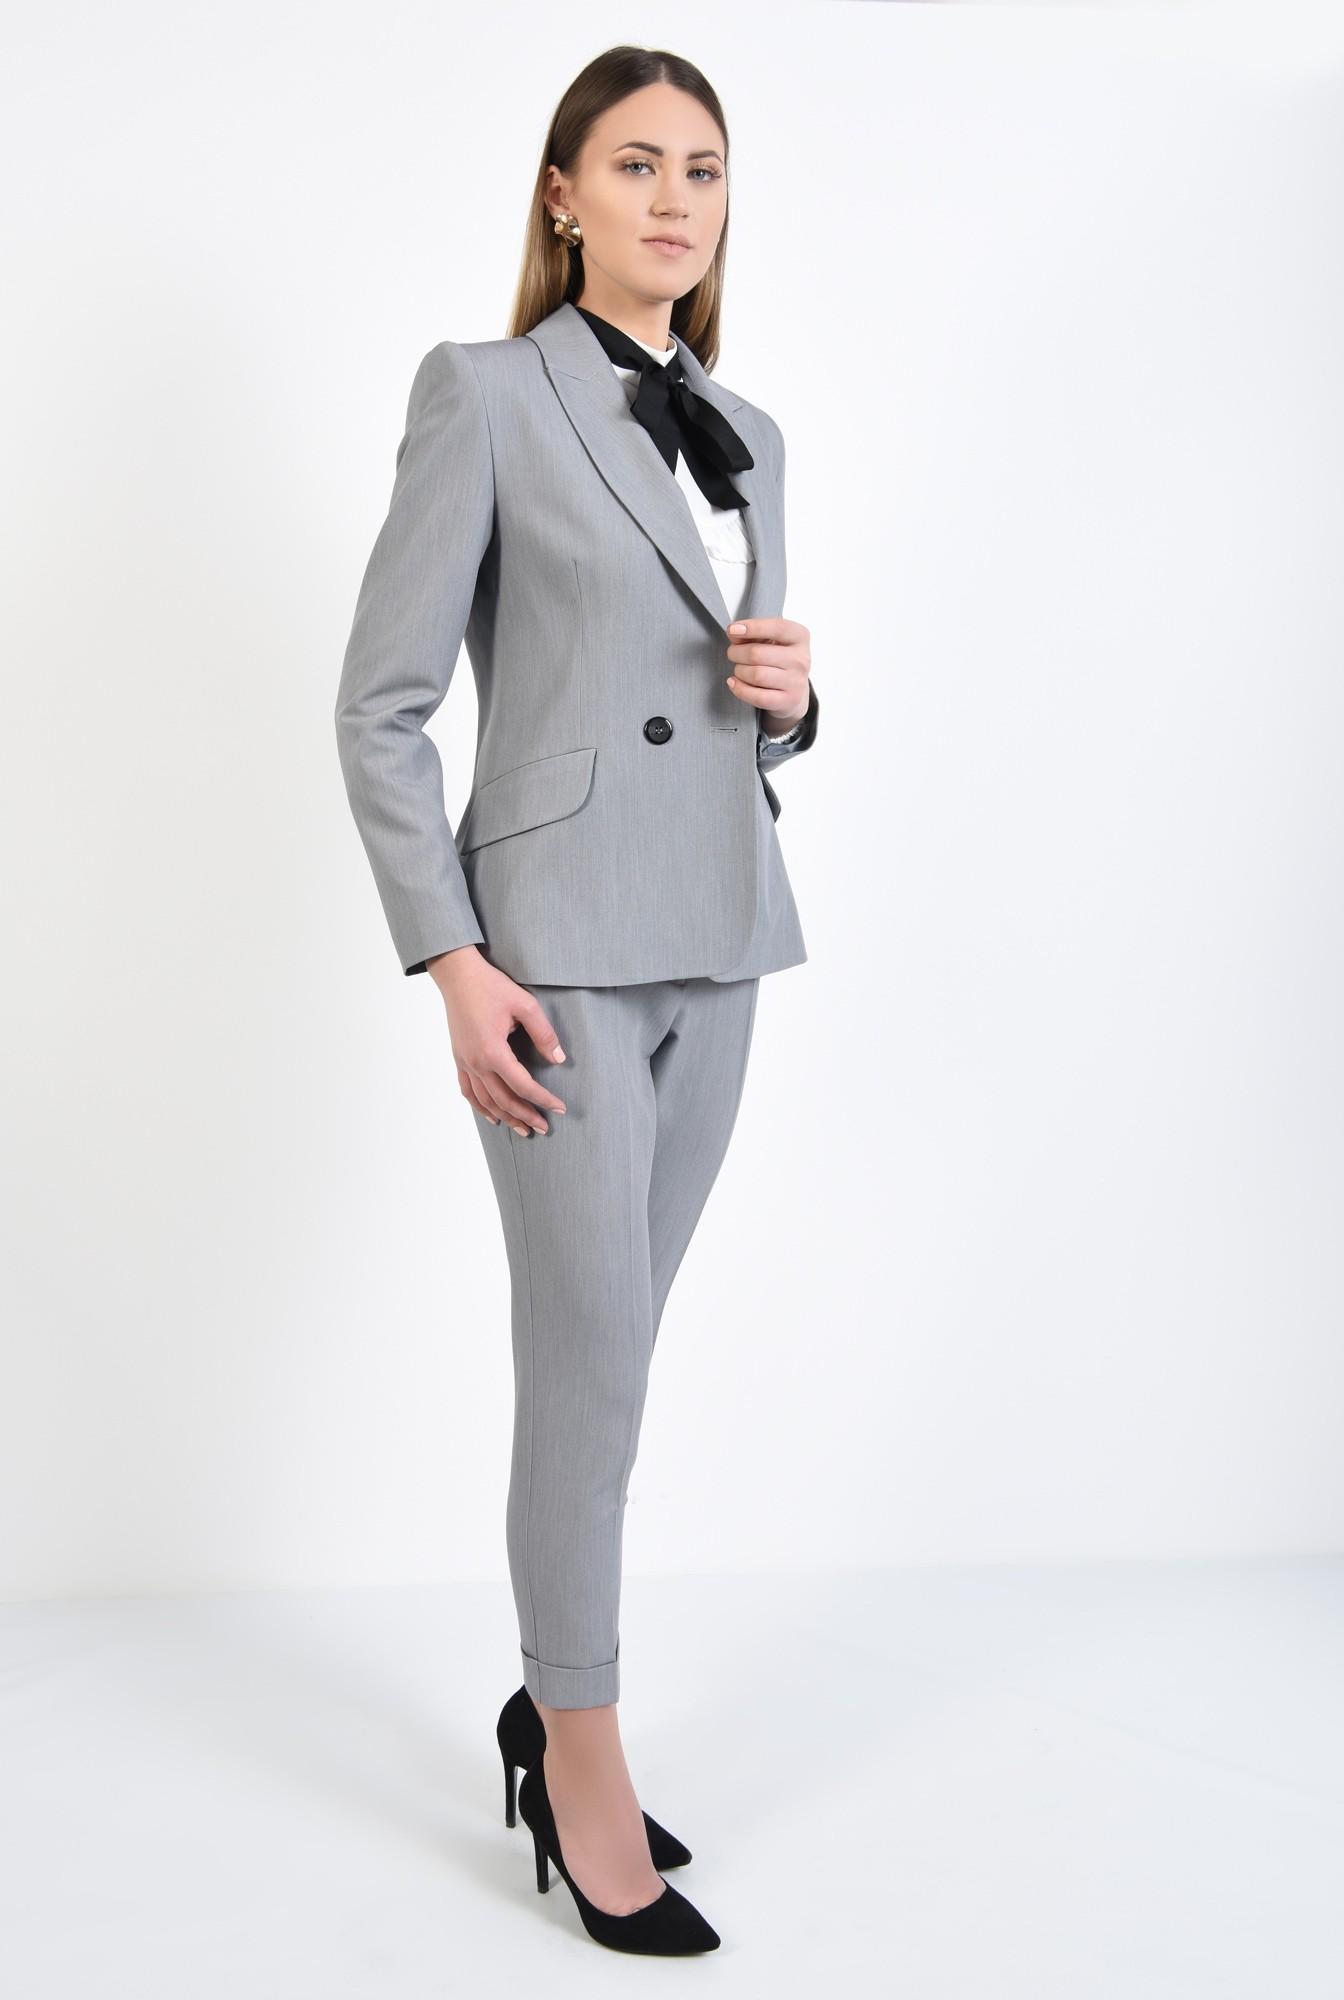 0 - pantaloni gri, office, croi conic, mansete